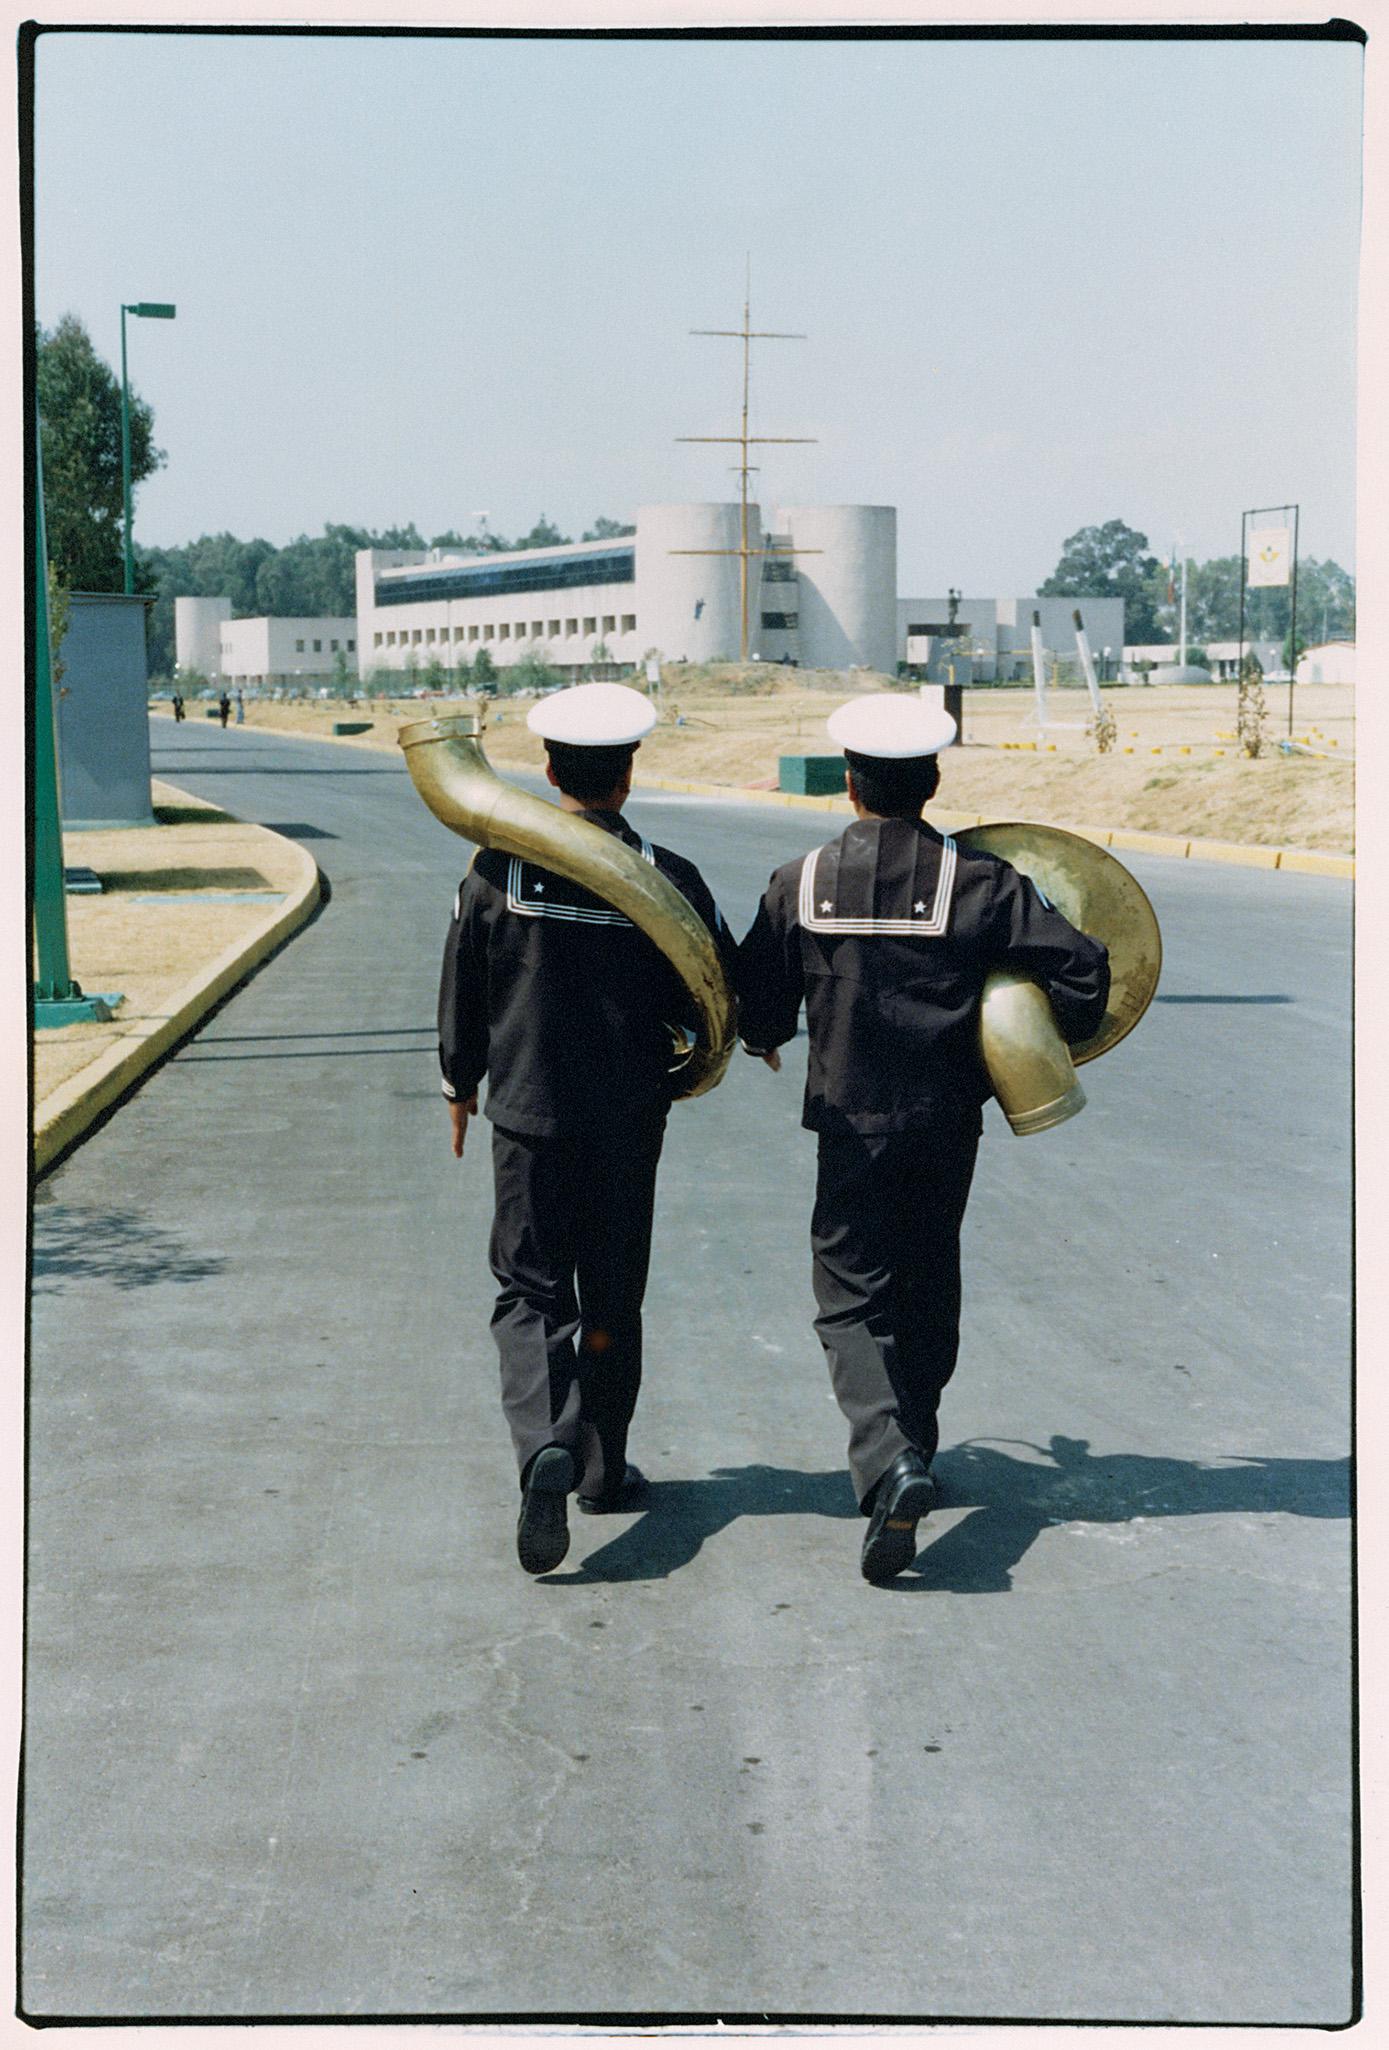 Francis Alÿs, Duett, 1999. Photo: Francis Alÿs.